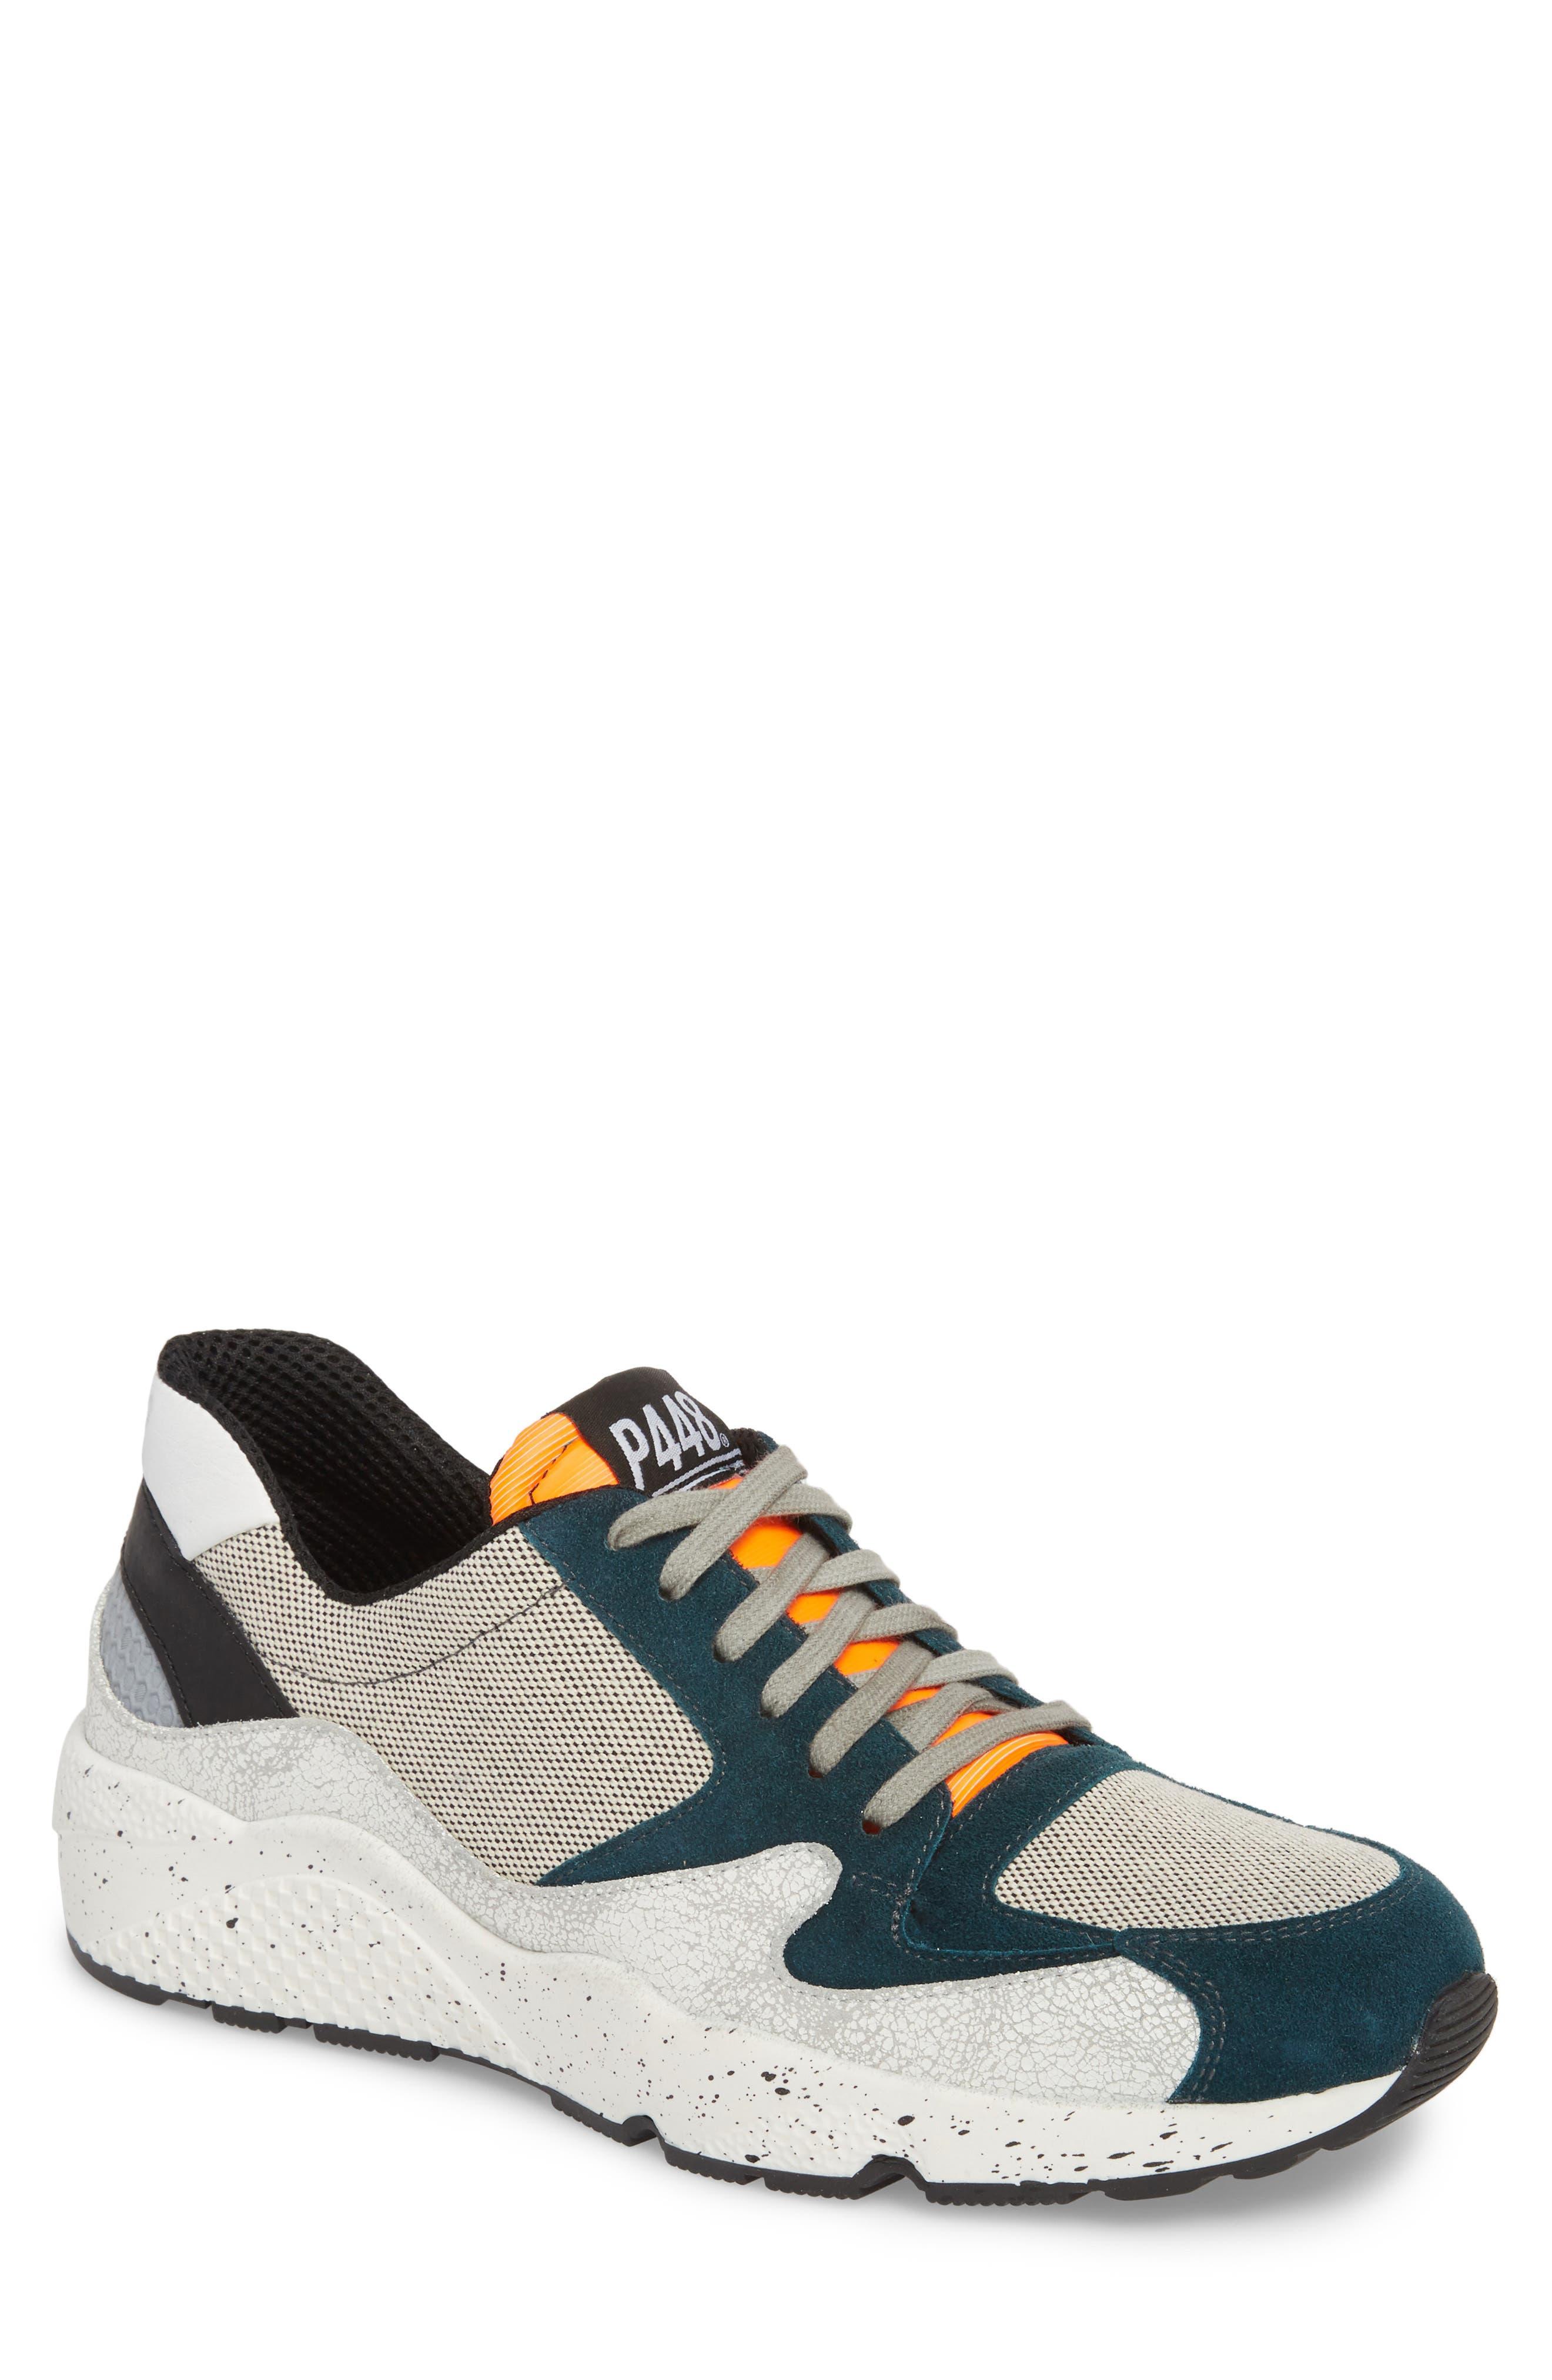 America Low Top Sneaker,                             Main thumbnail 1, color,                             White